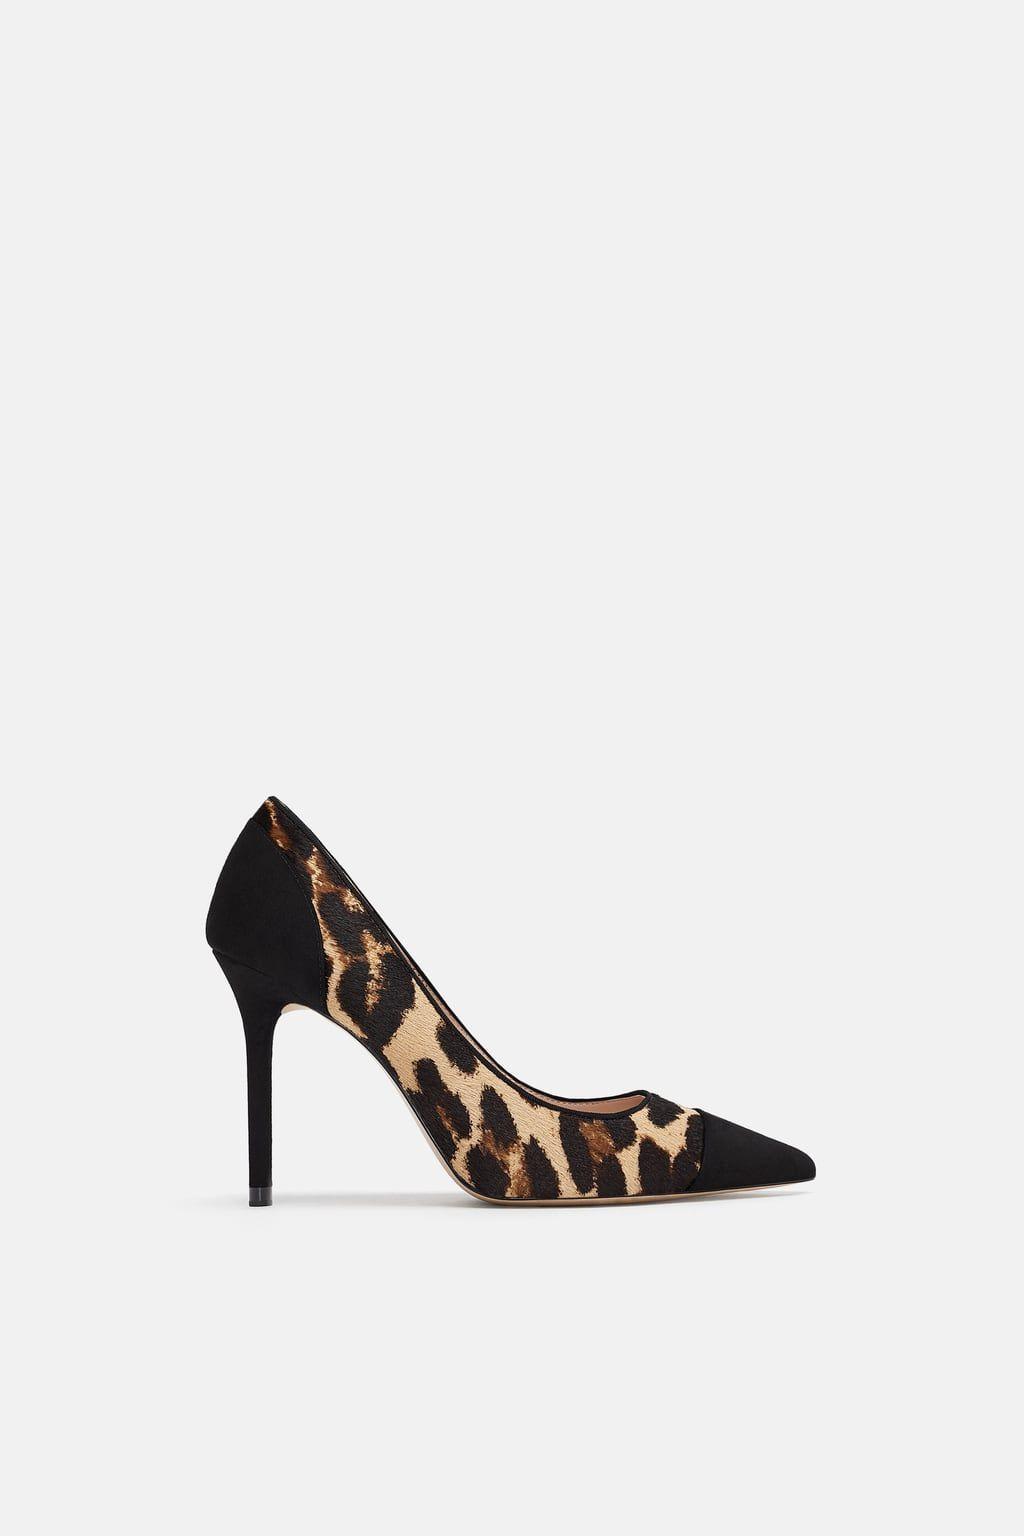 Animal print shoes heels